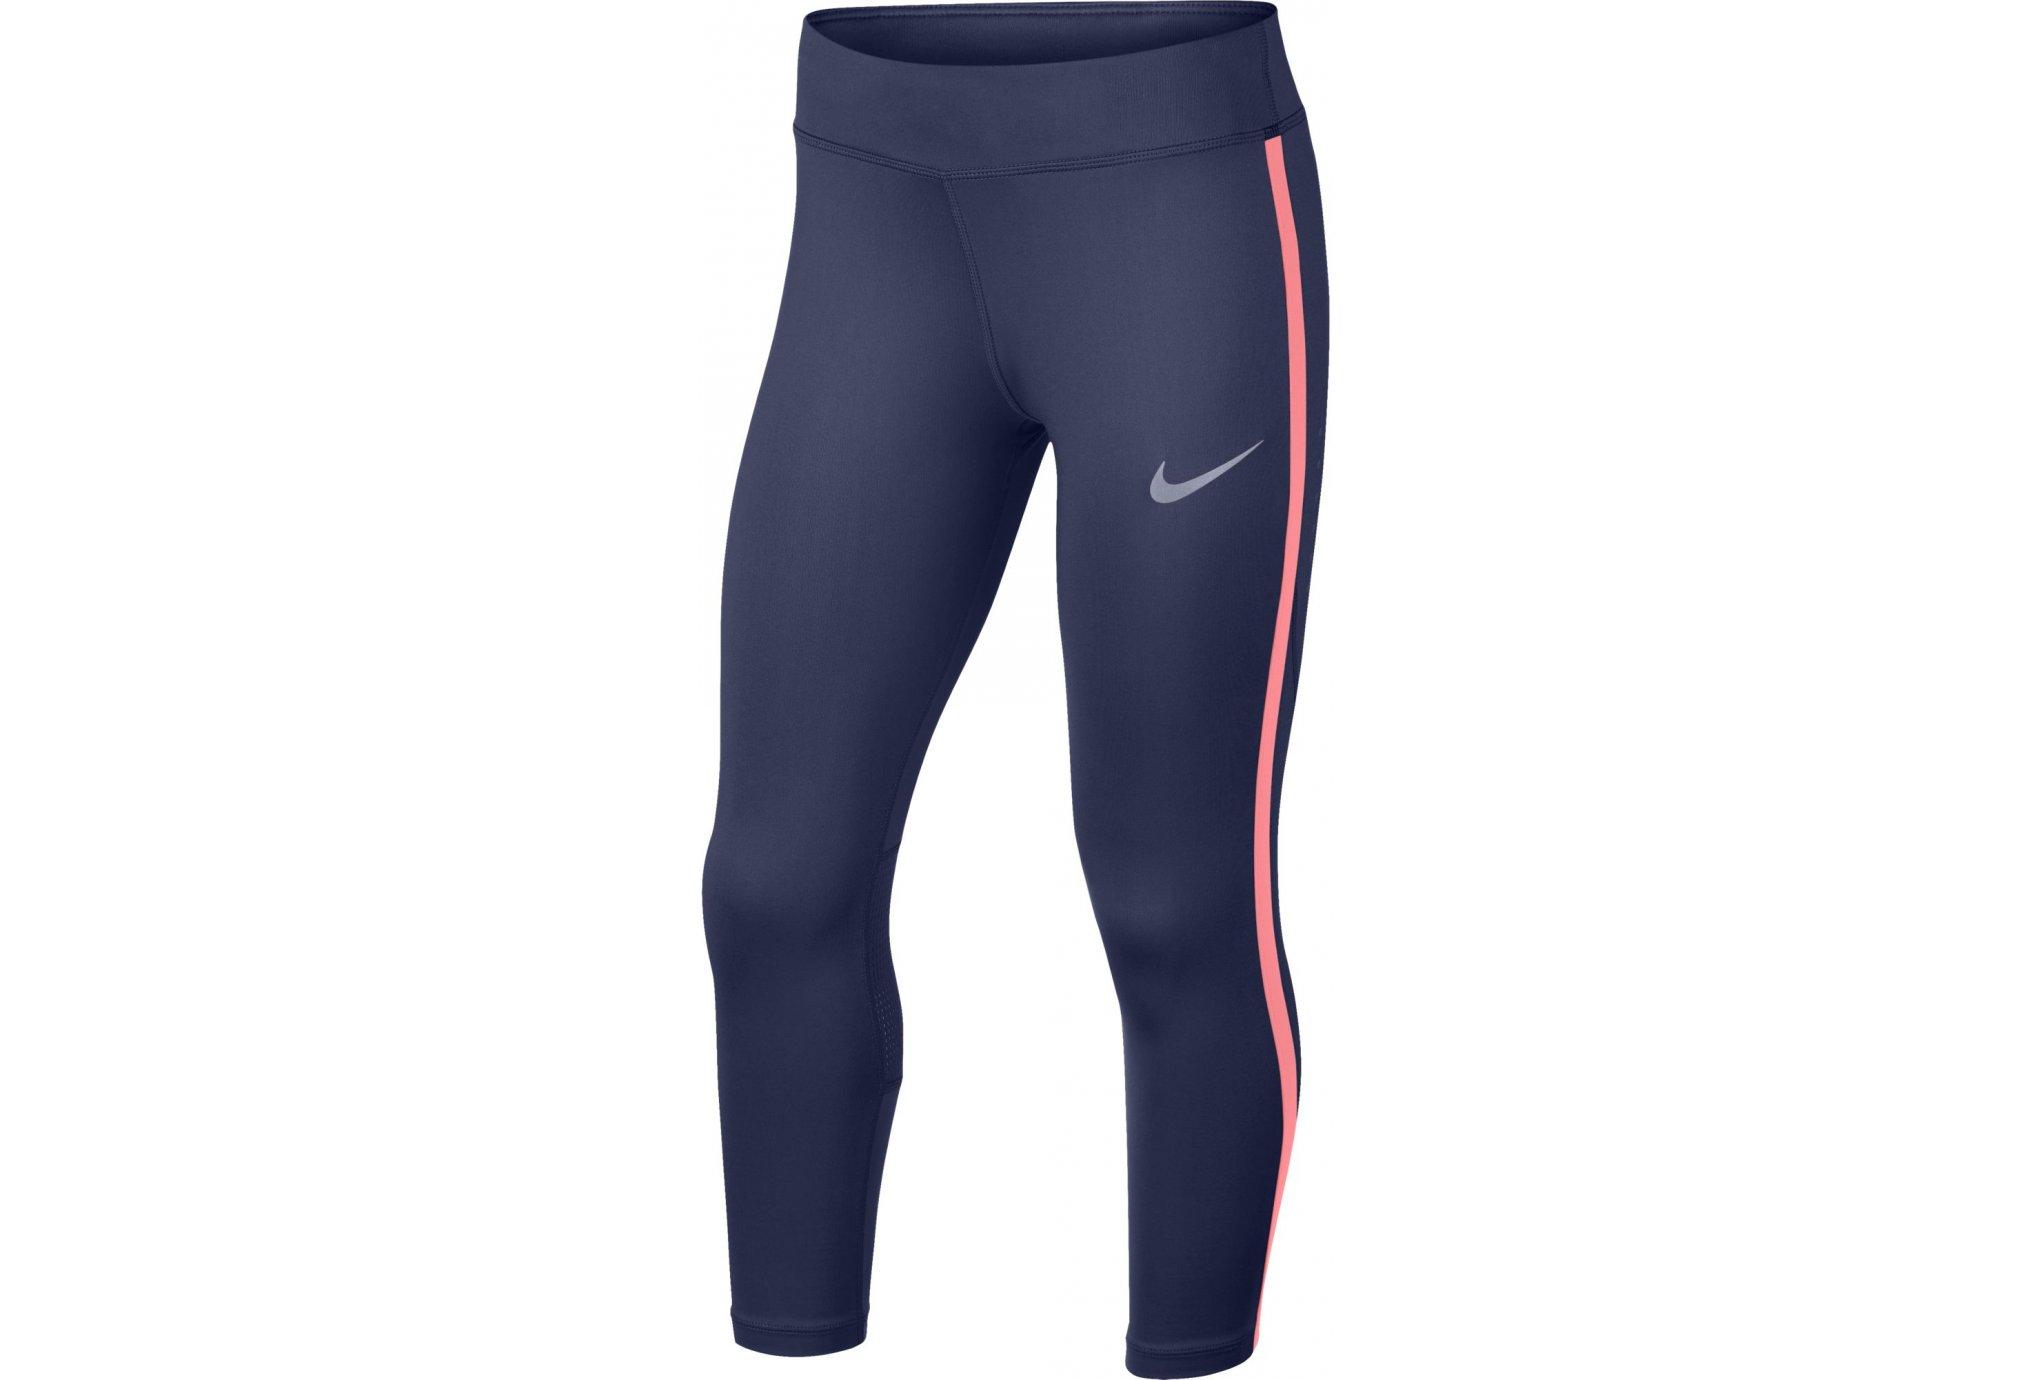 Nike Power Run Fille vêtement running femme